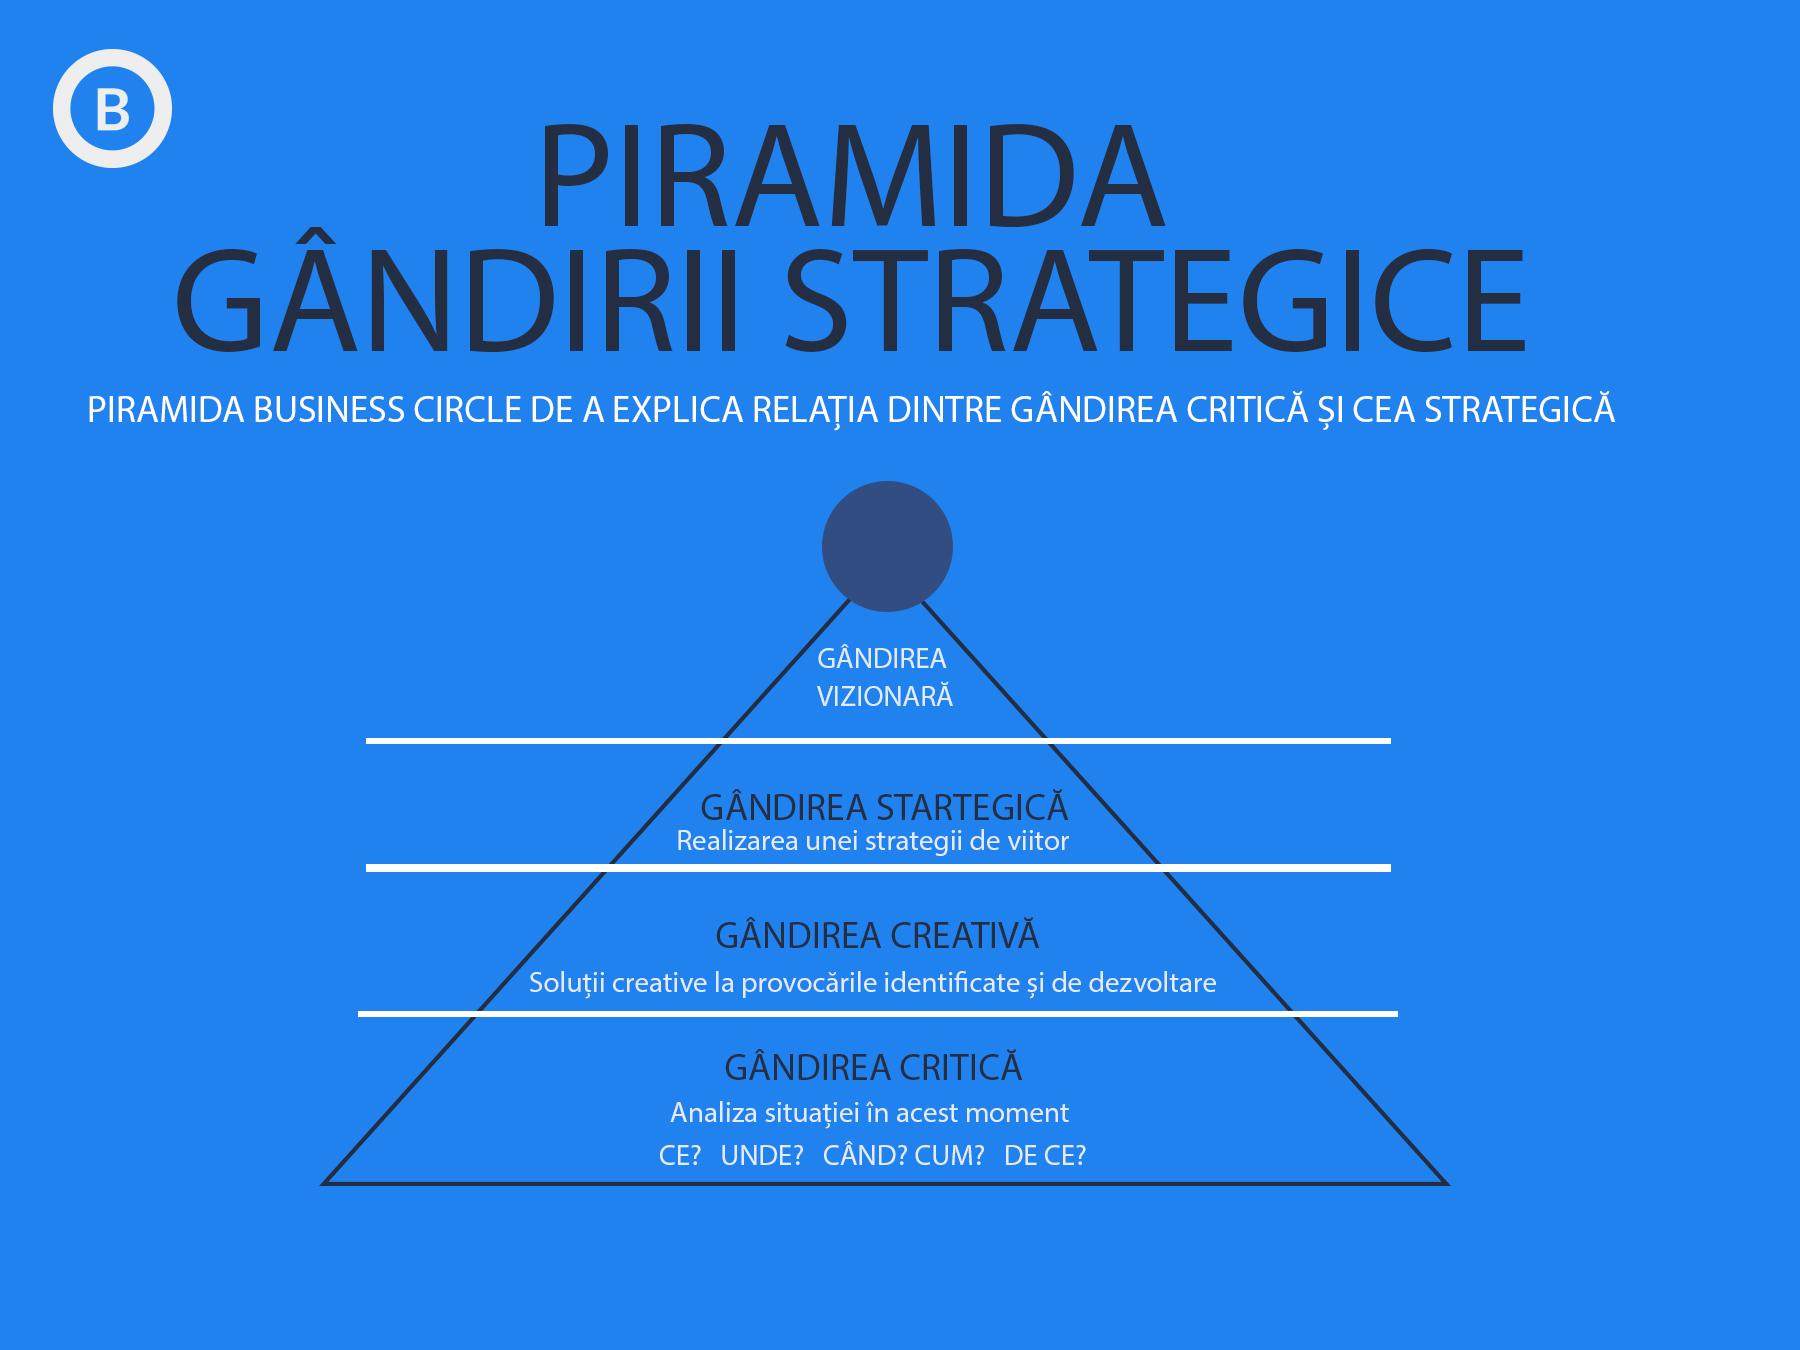 Piramida Gândirii Strategice a Business Circle